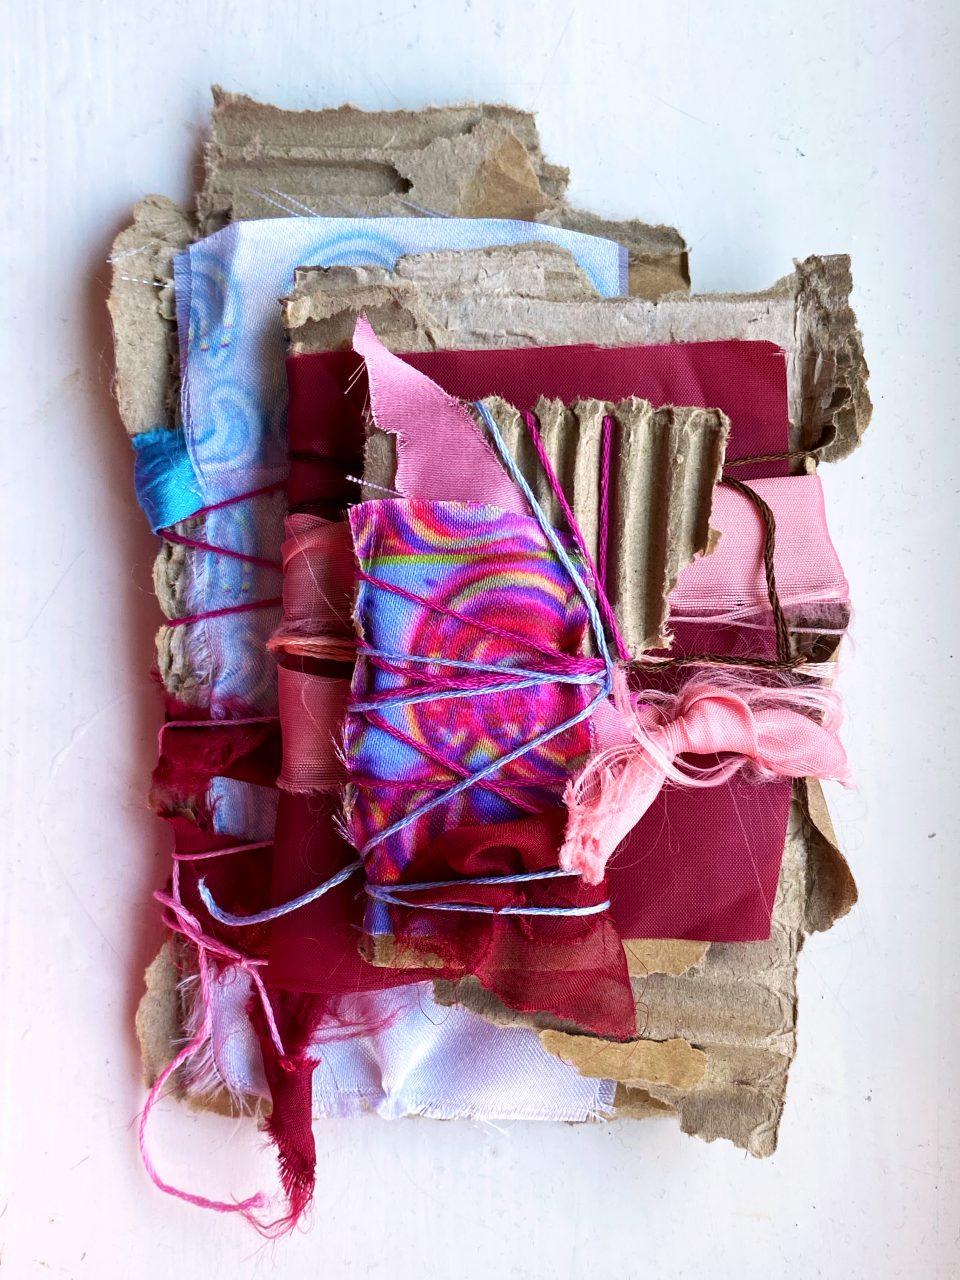 18 cm x 12 cm x 1.5 cm 'The Embodiment of Incomprehensible' March 2021. (fabric, thread, cardboard)